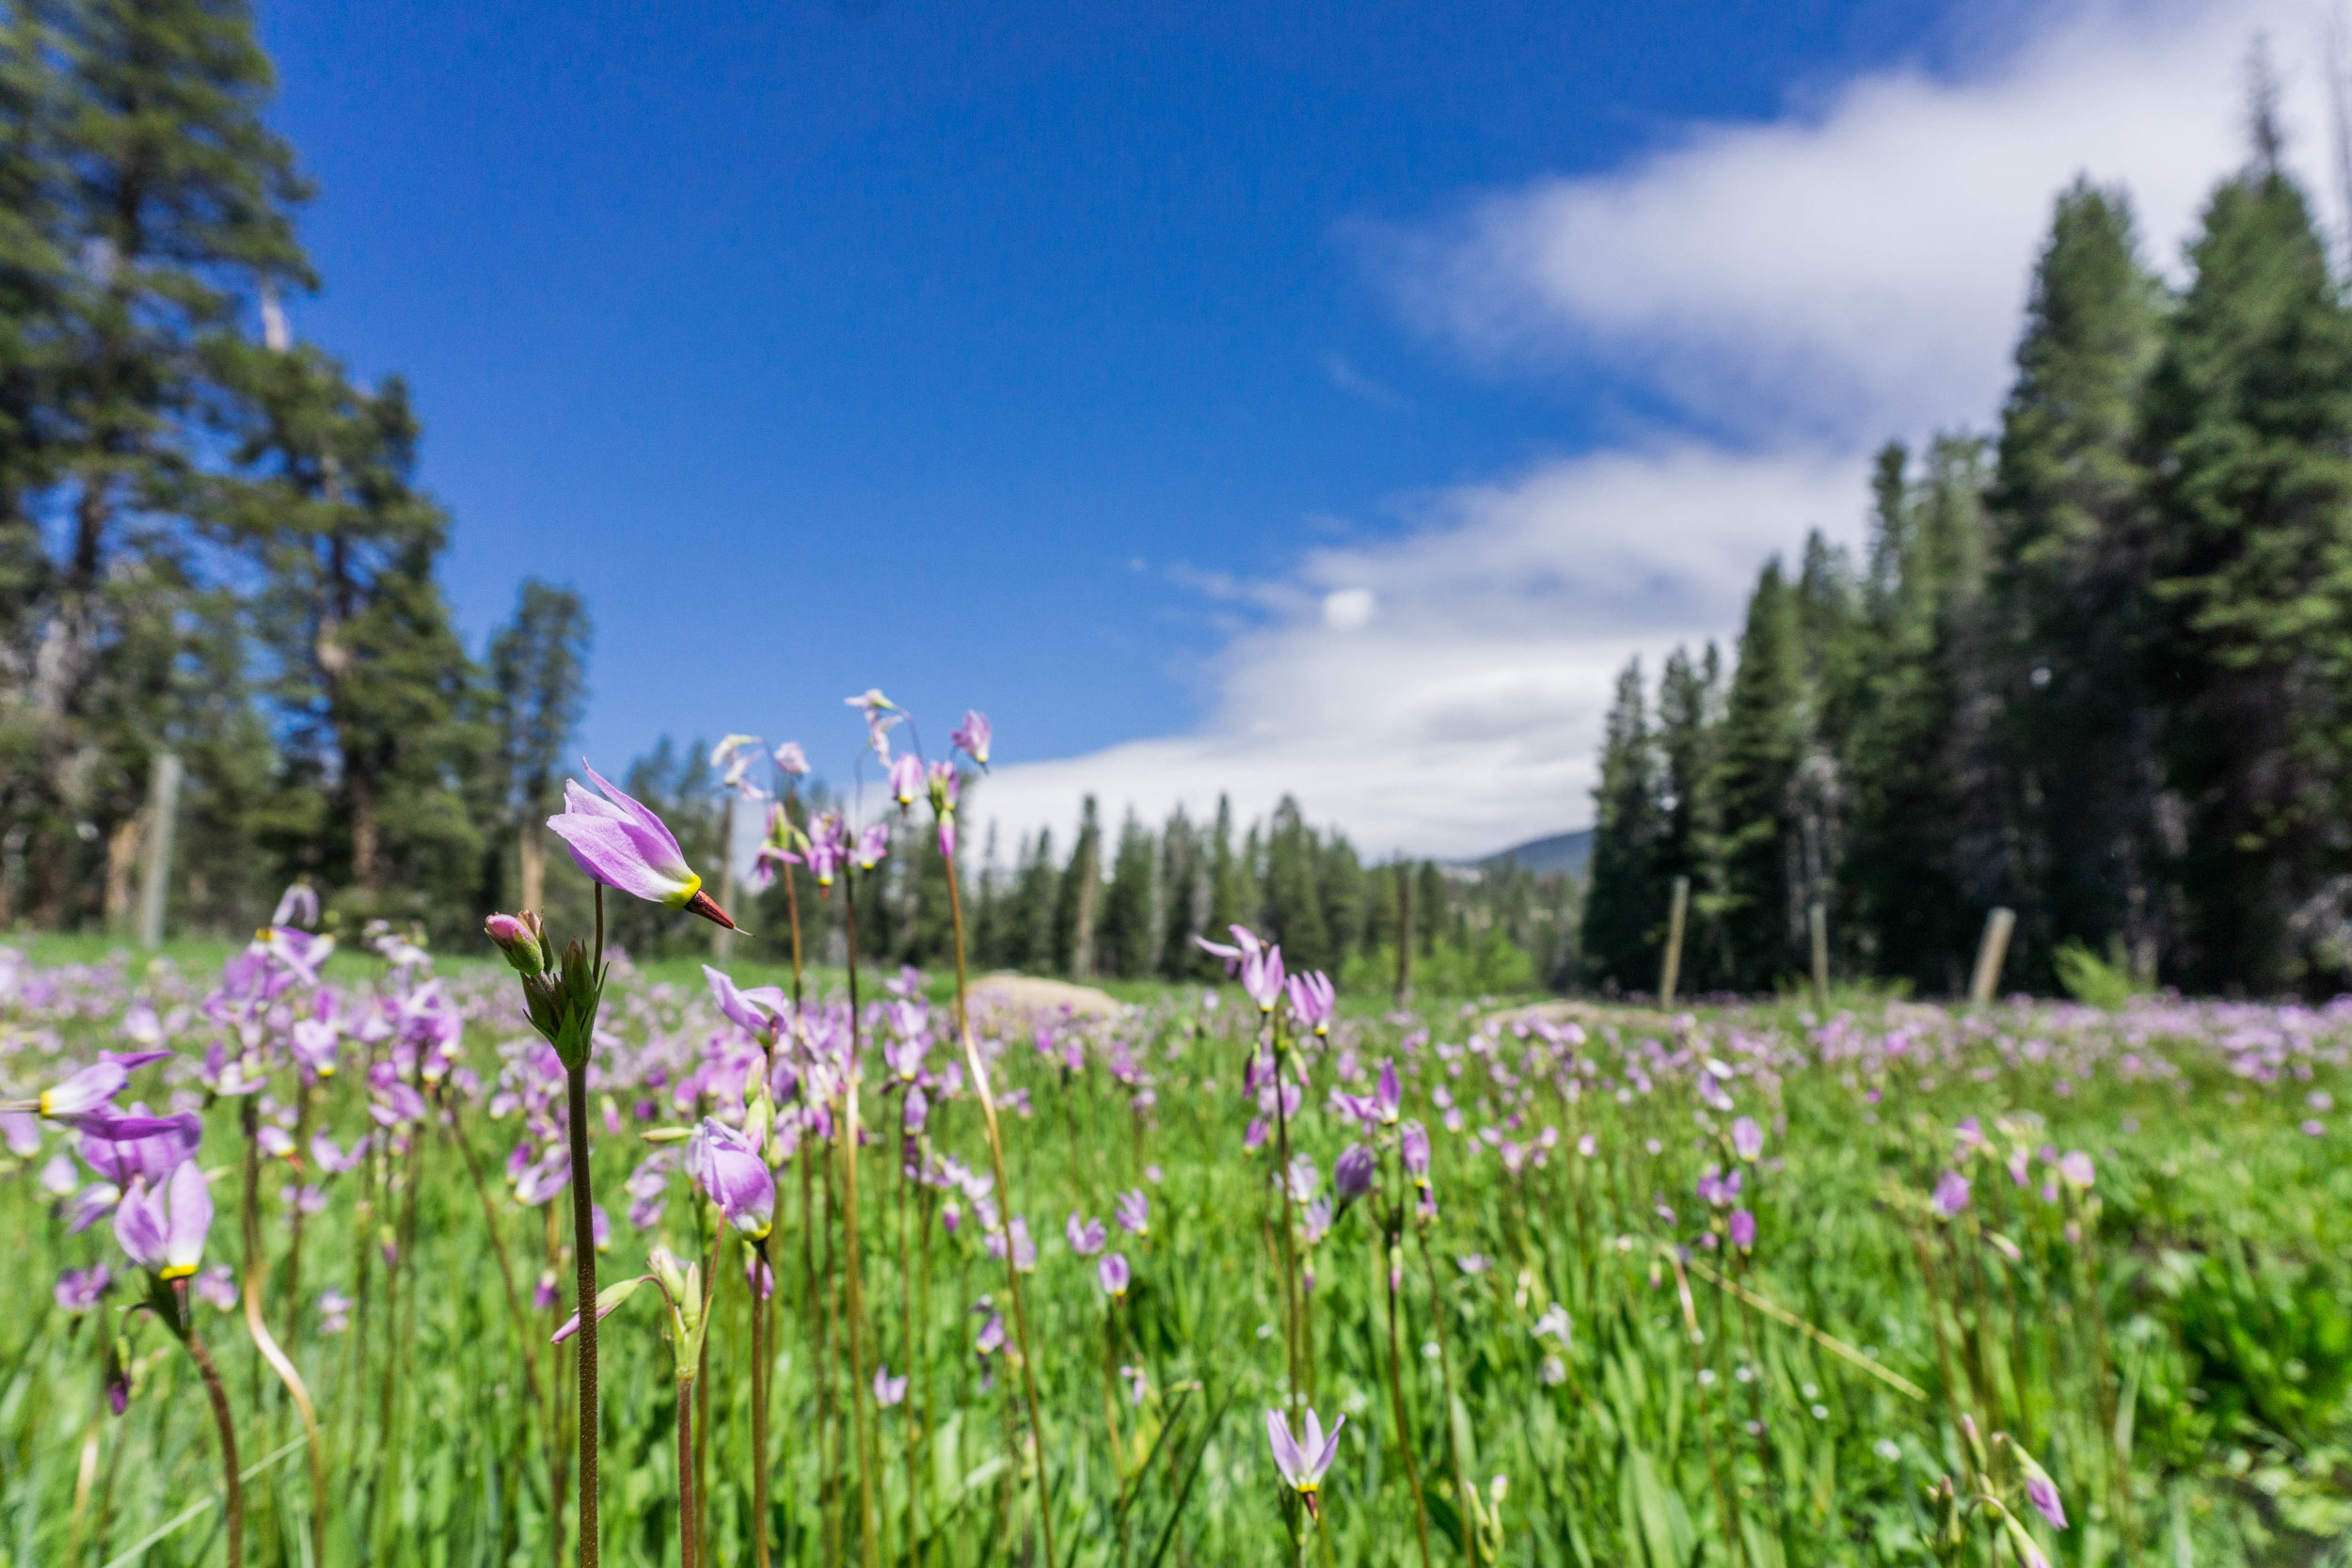 Sierra-Vista-Scenic-Byway-madera-county-yellow-wildflower-orange-butterfly-liz-christie-photo.jpg